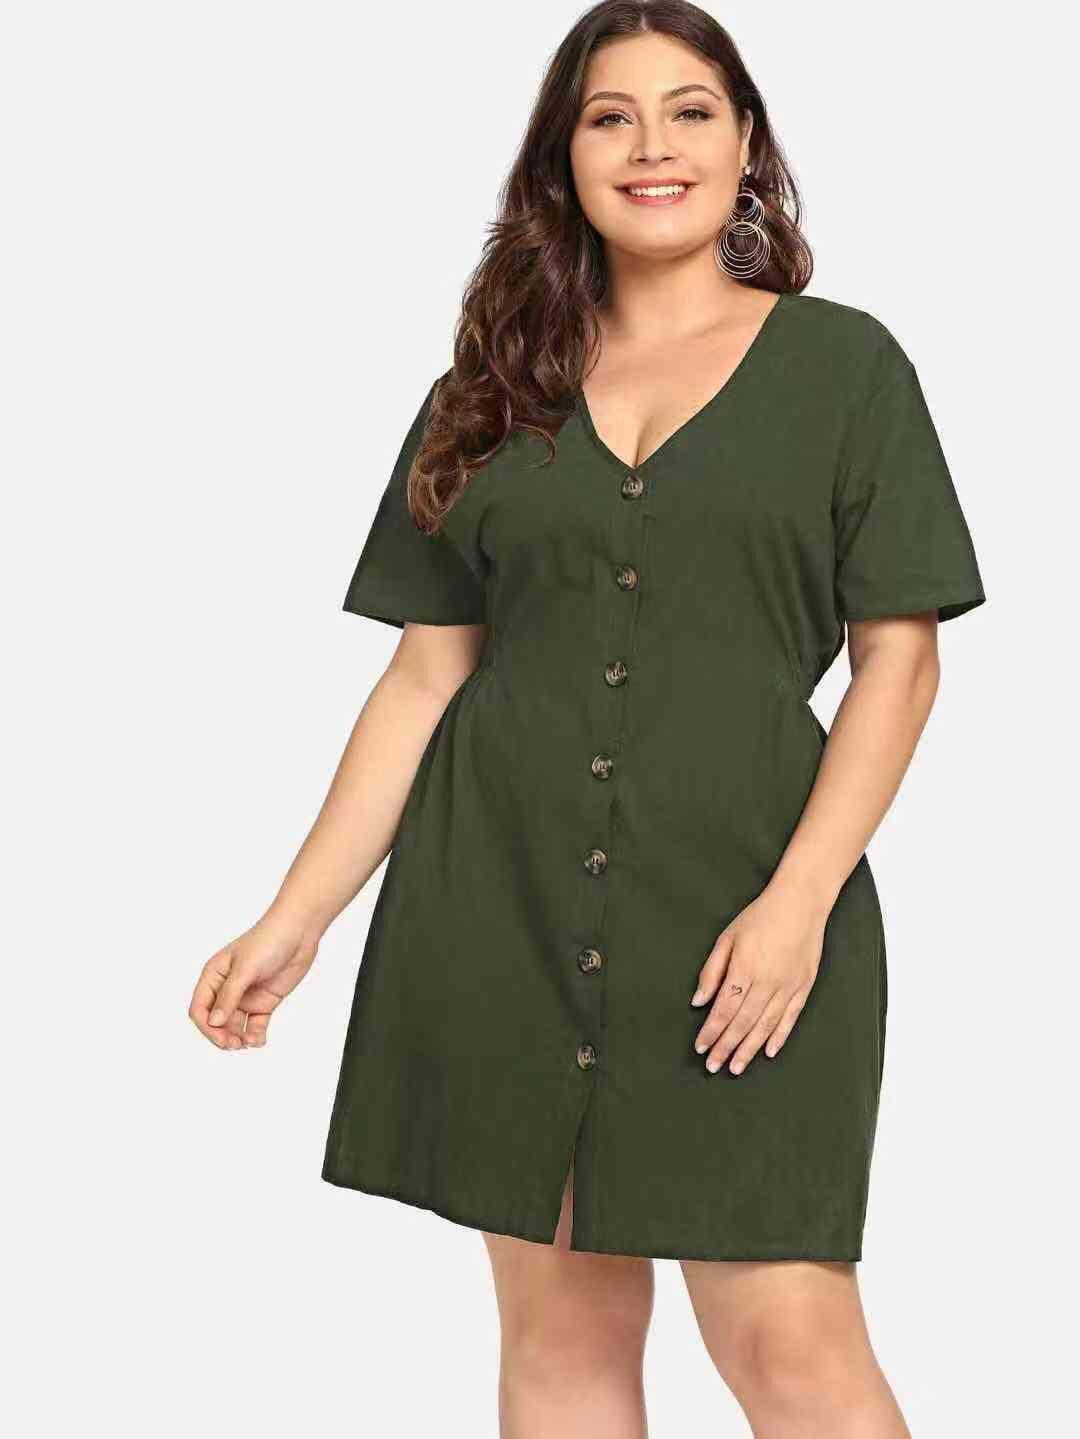 94b0f6deef688 Fashion Dresses for sale - Dress for Women online brands